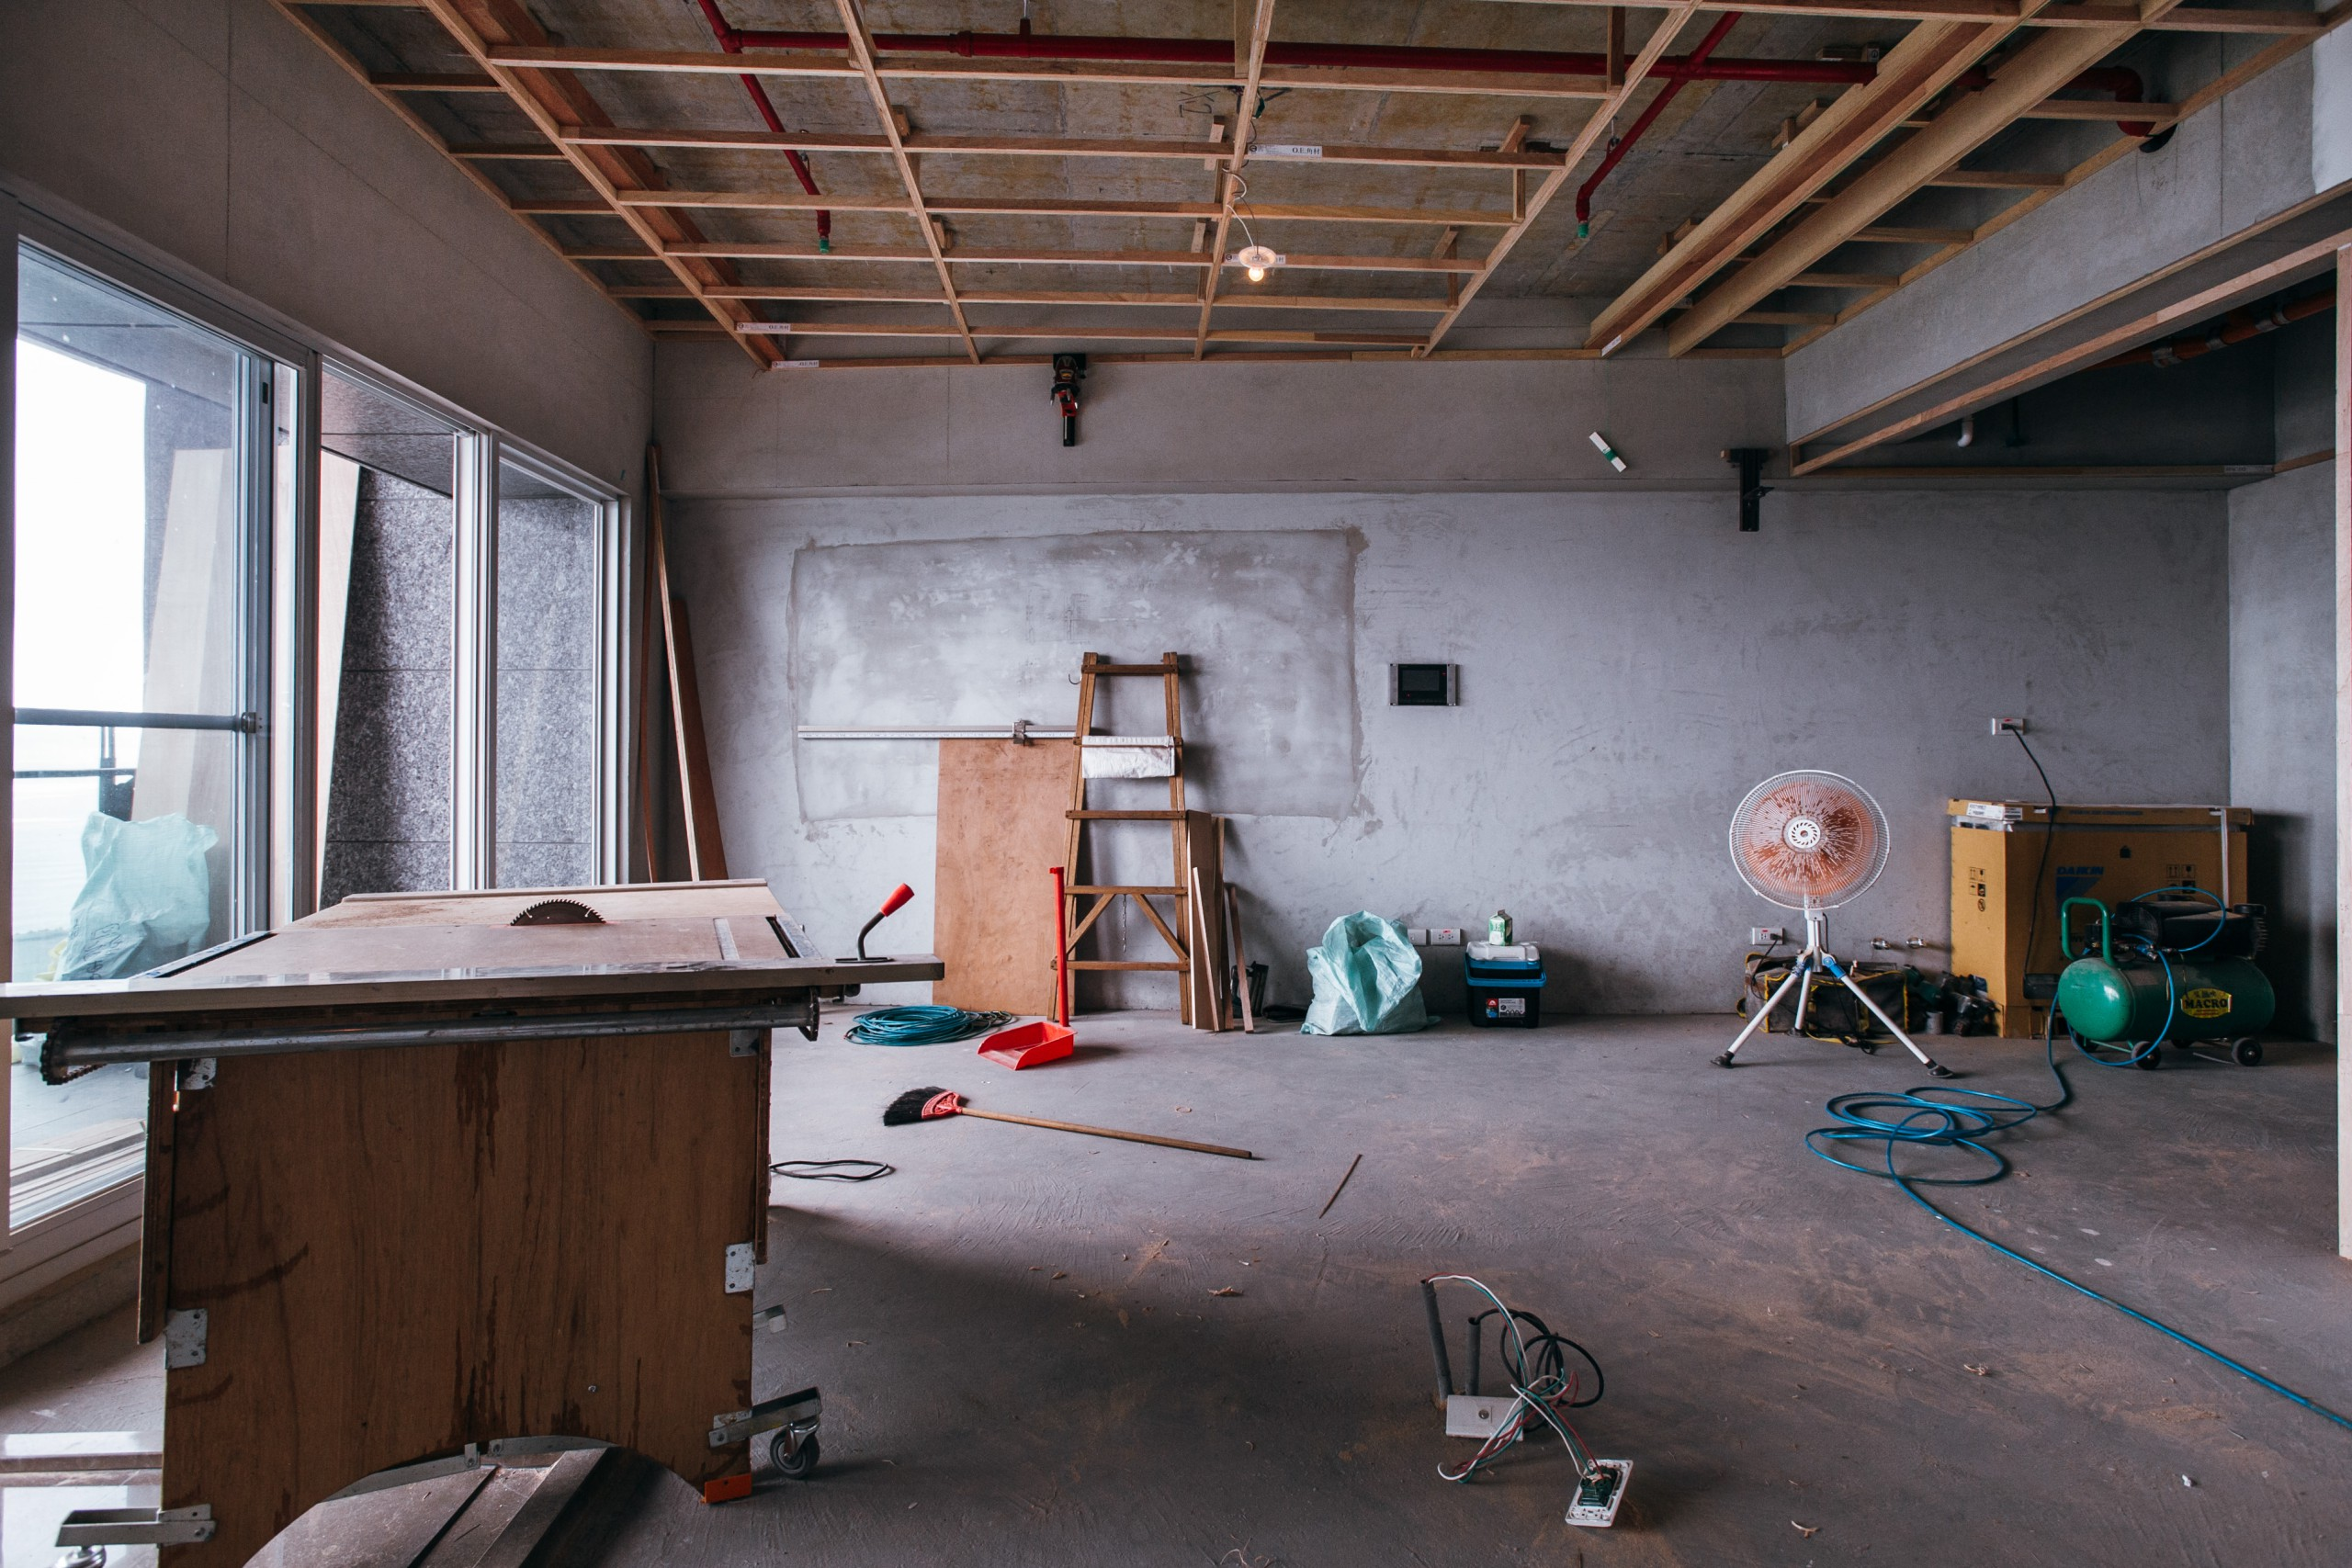 德築-DEZU-project-世界灣自宅裝修-architecture-interior-renovation-5